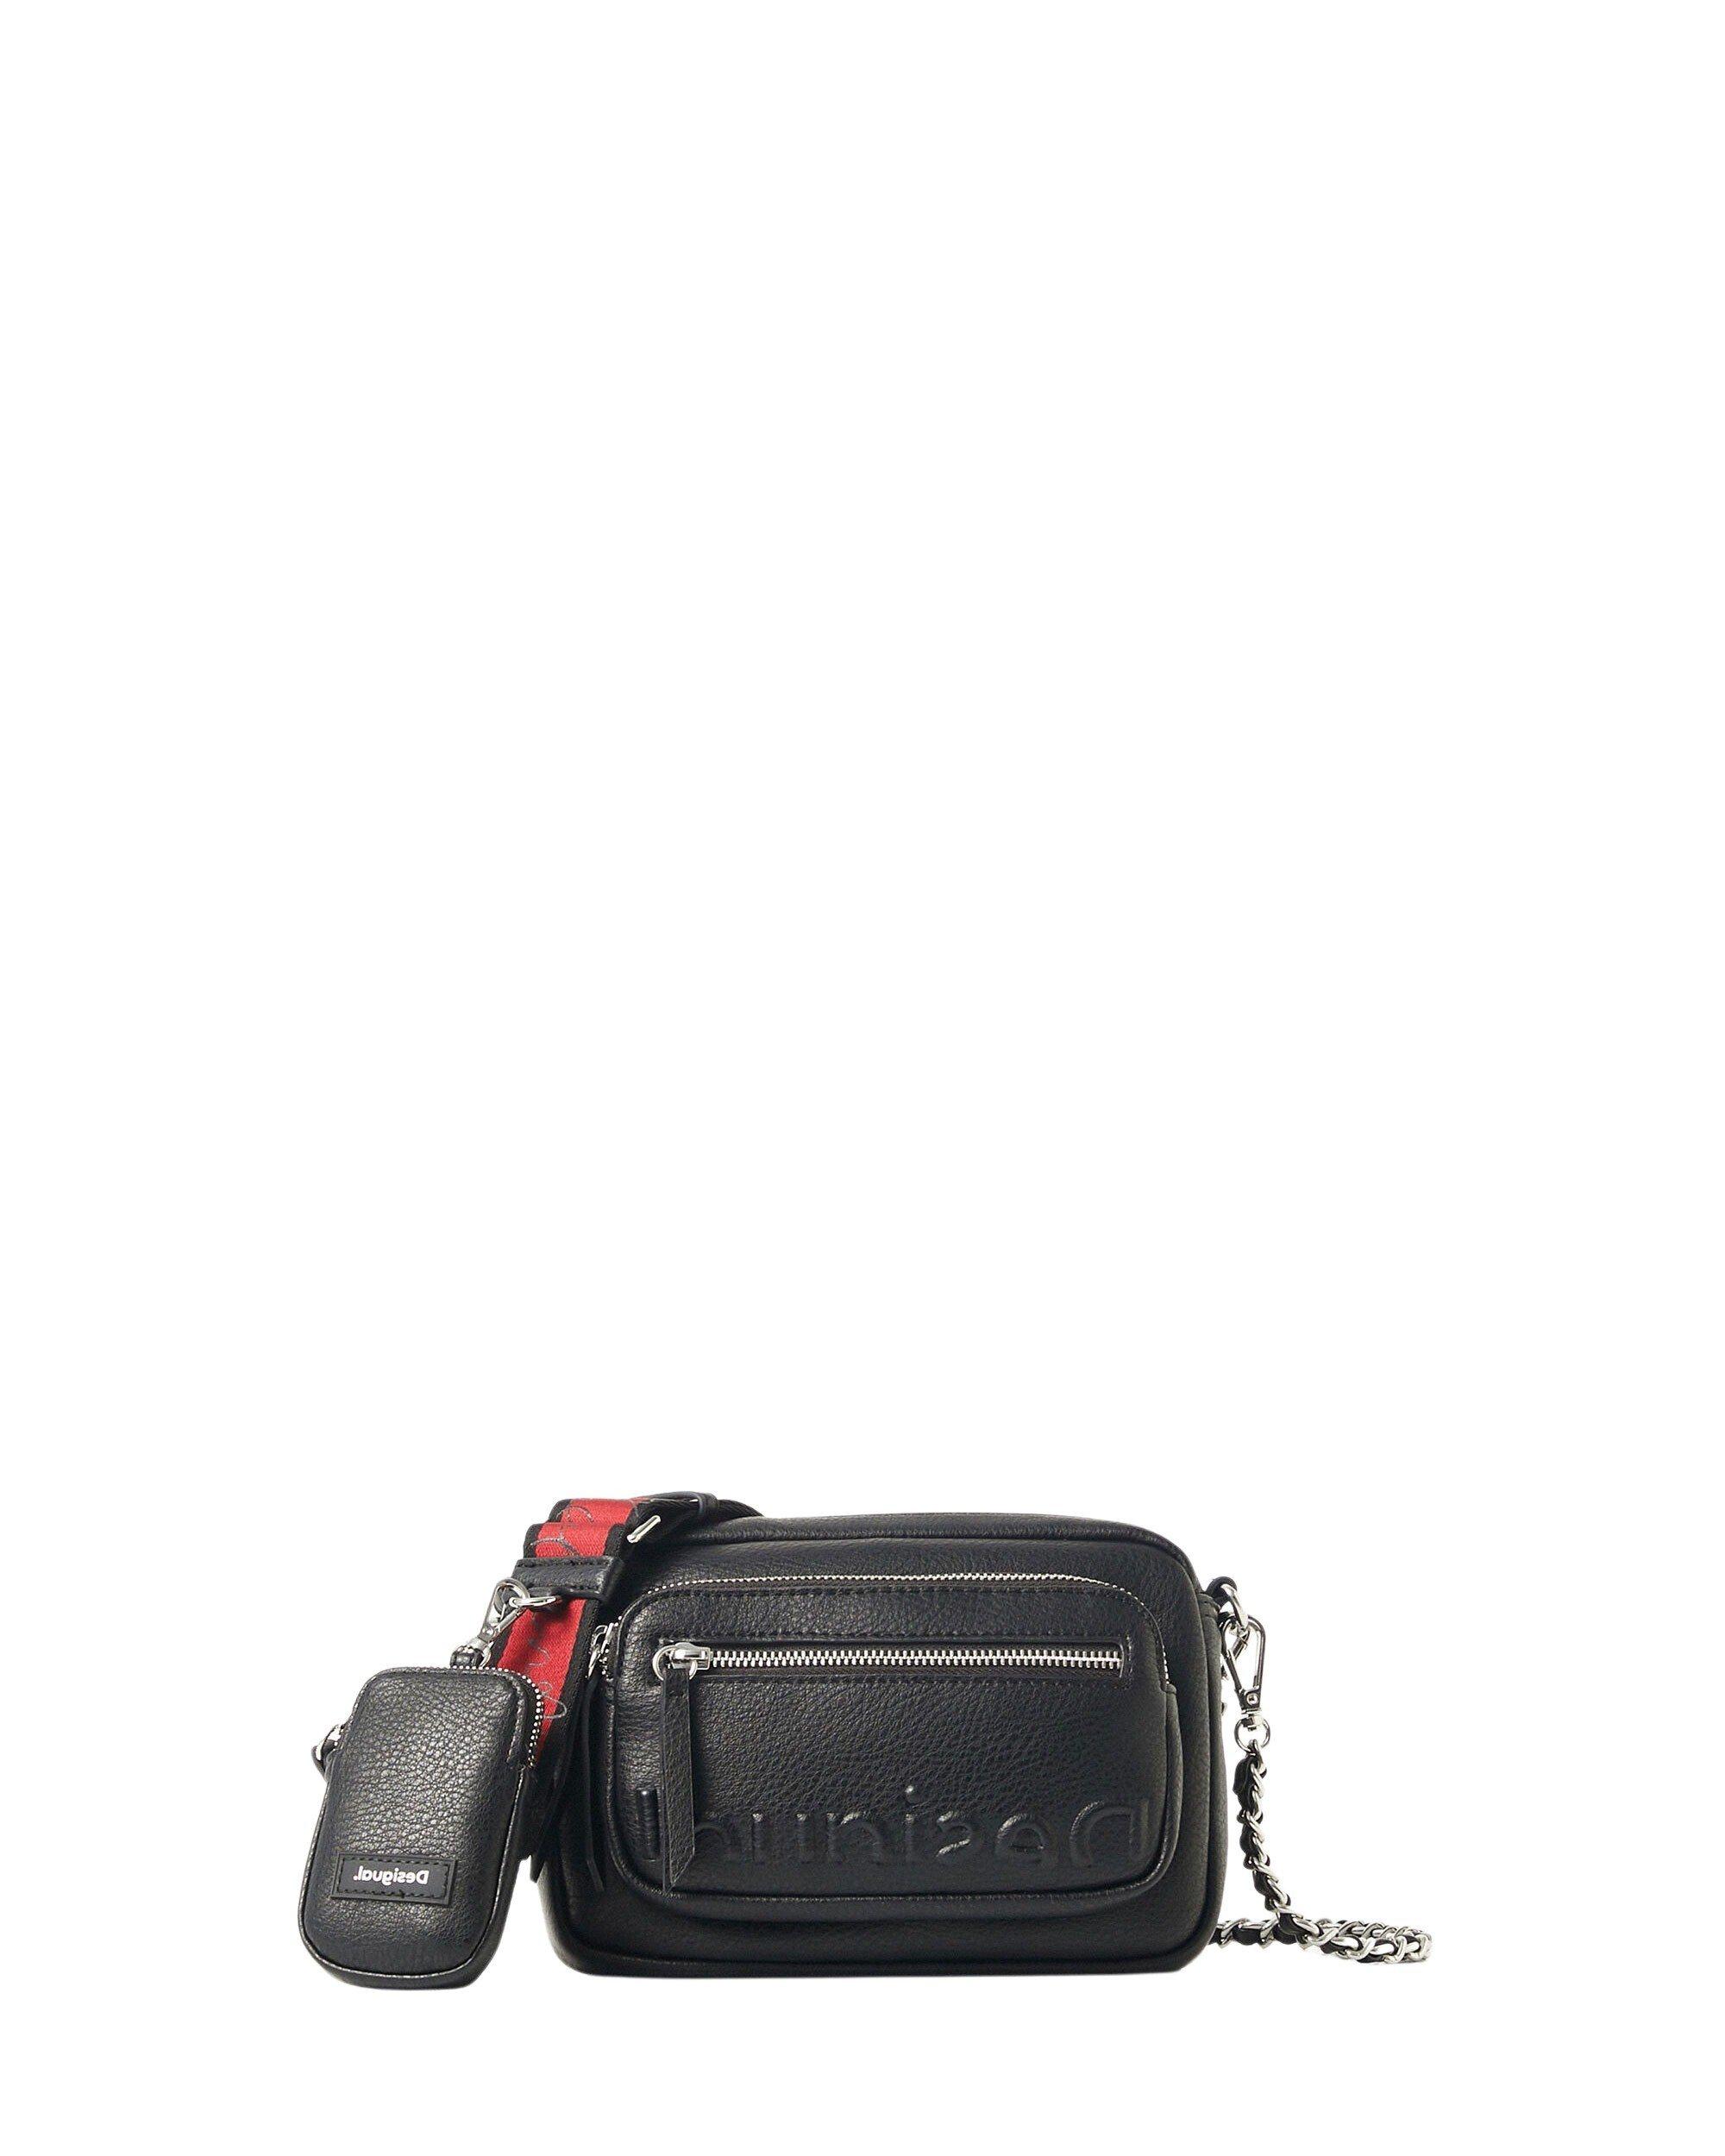 Desigual Women's Handbag Beige 305857 - black UNICA